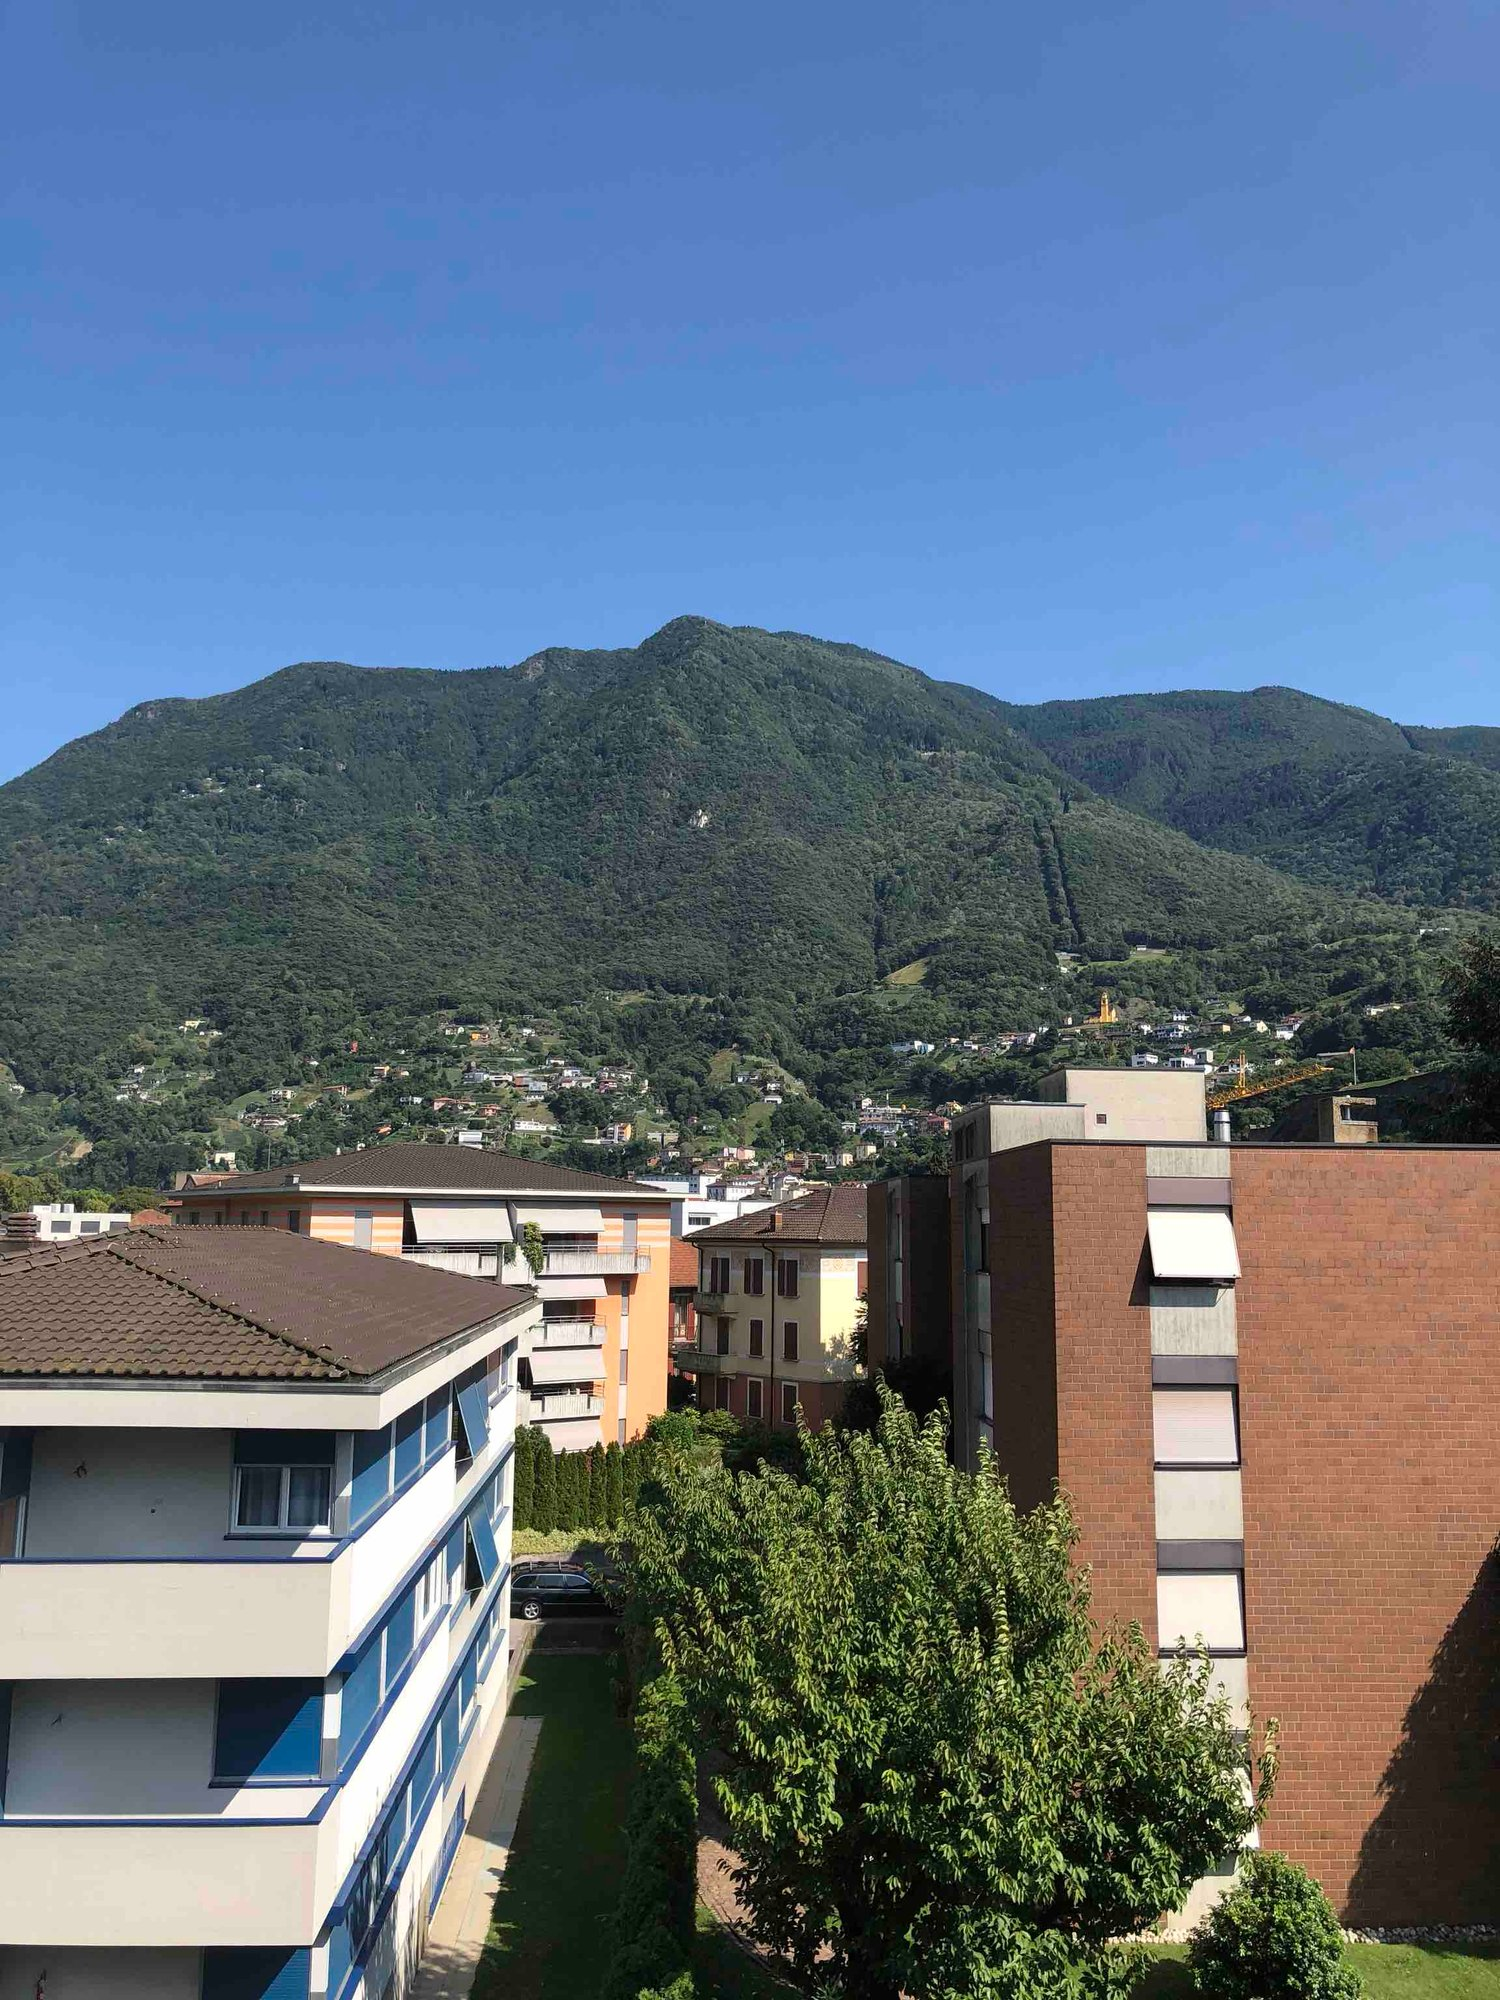 Via Mirasole 14